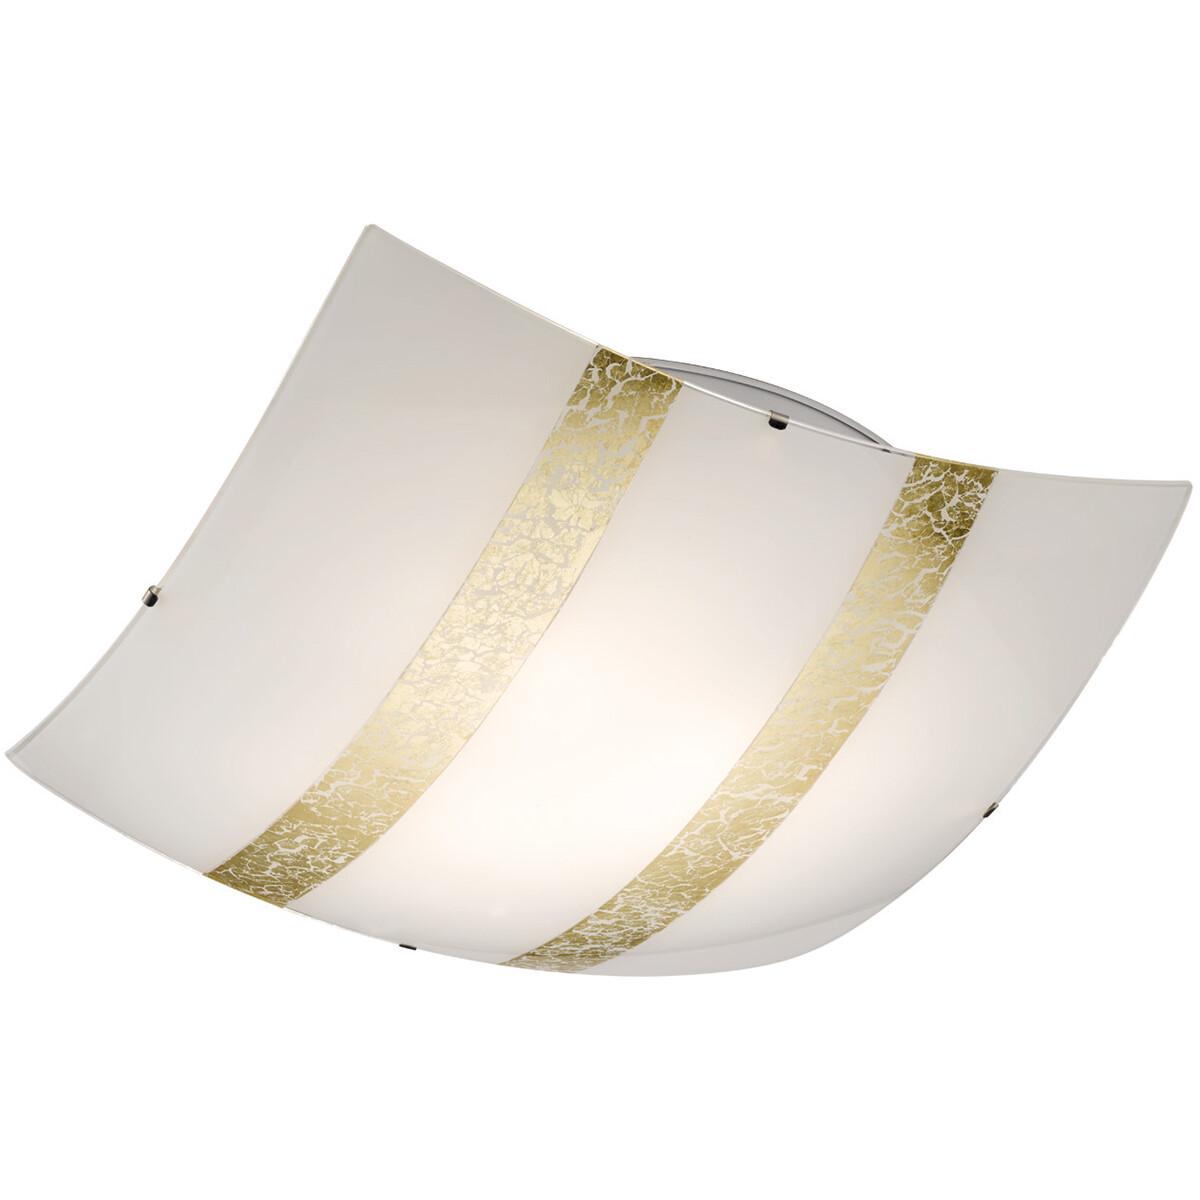 LED Plafondlamp - Plafondverlichting - Trion Niki - E27 Fitting - 3-lichts - Vierkant - Mat Goud - G